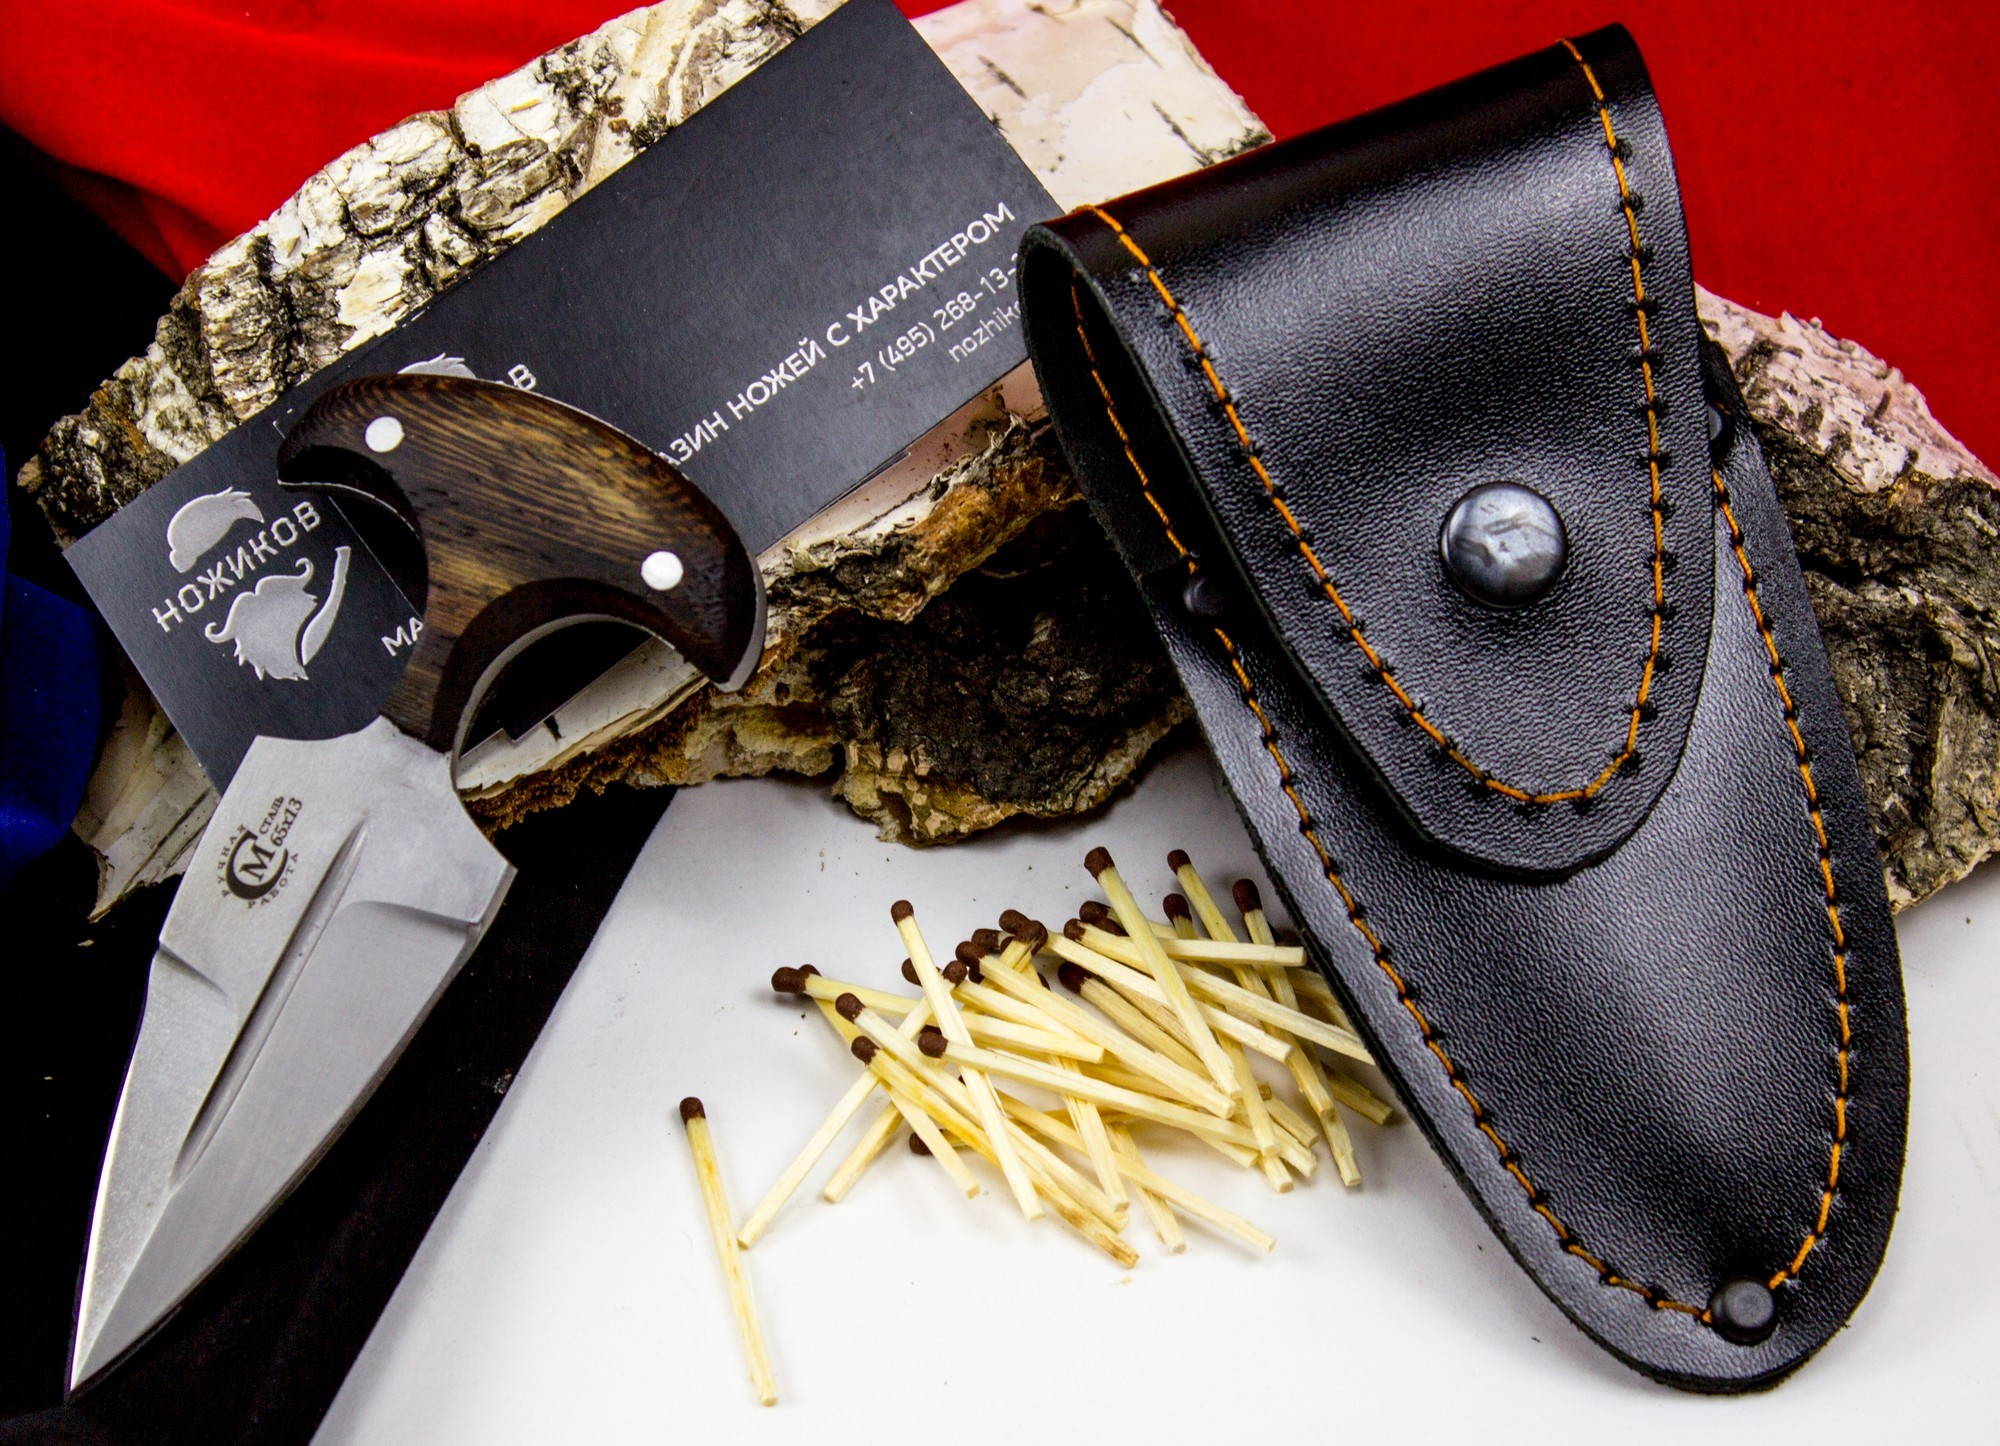 Фото 3 - Нож тычковый Пиранья, сталь 65Х13 от Кузница Семина